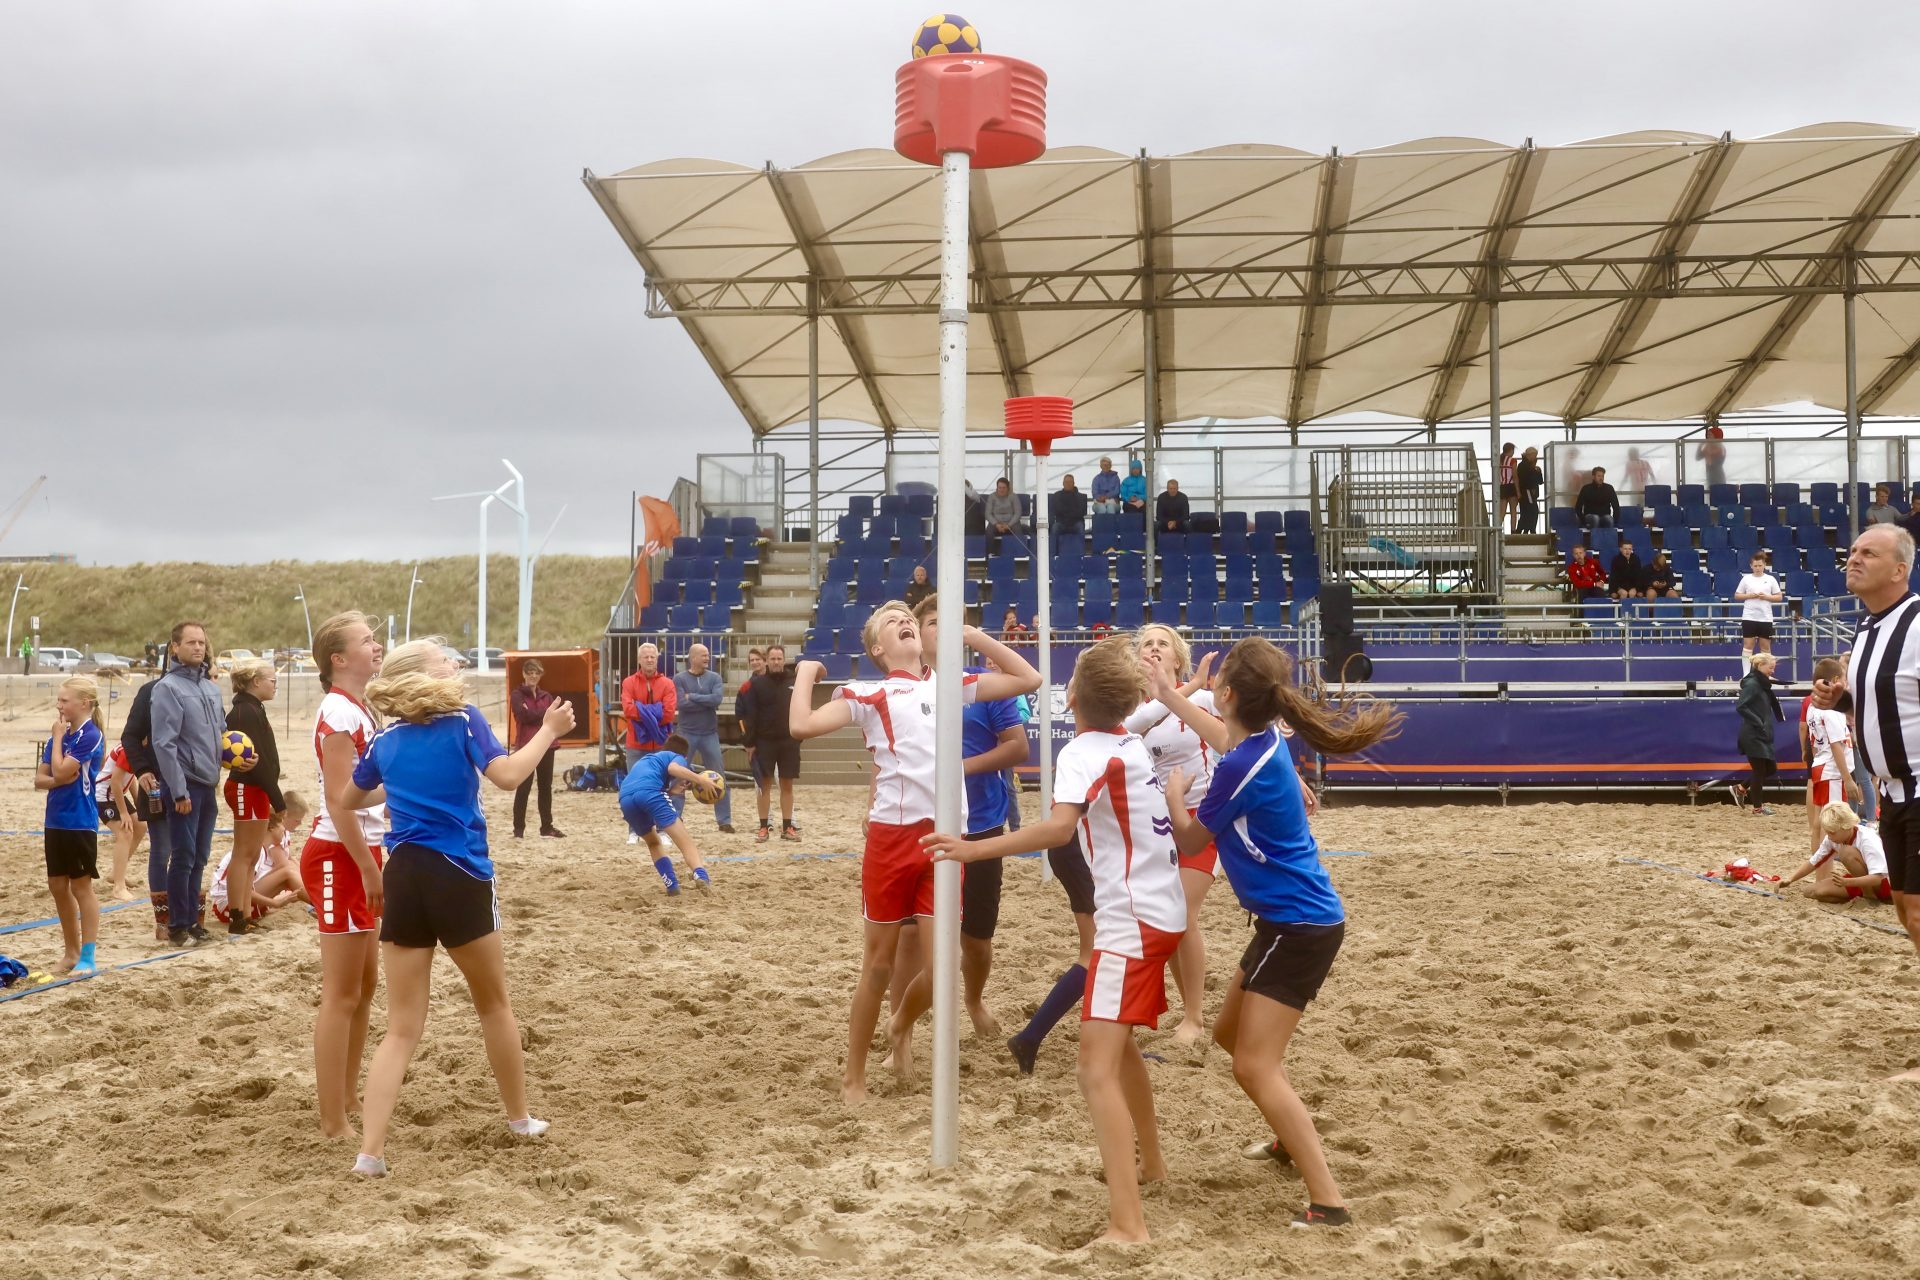 NK Beachkorfbal: nog één week om je aan te melden